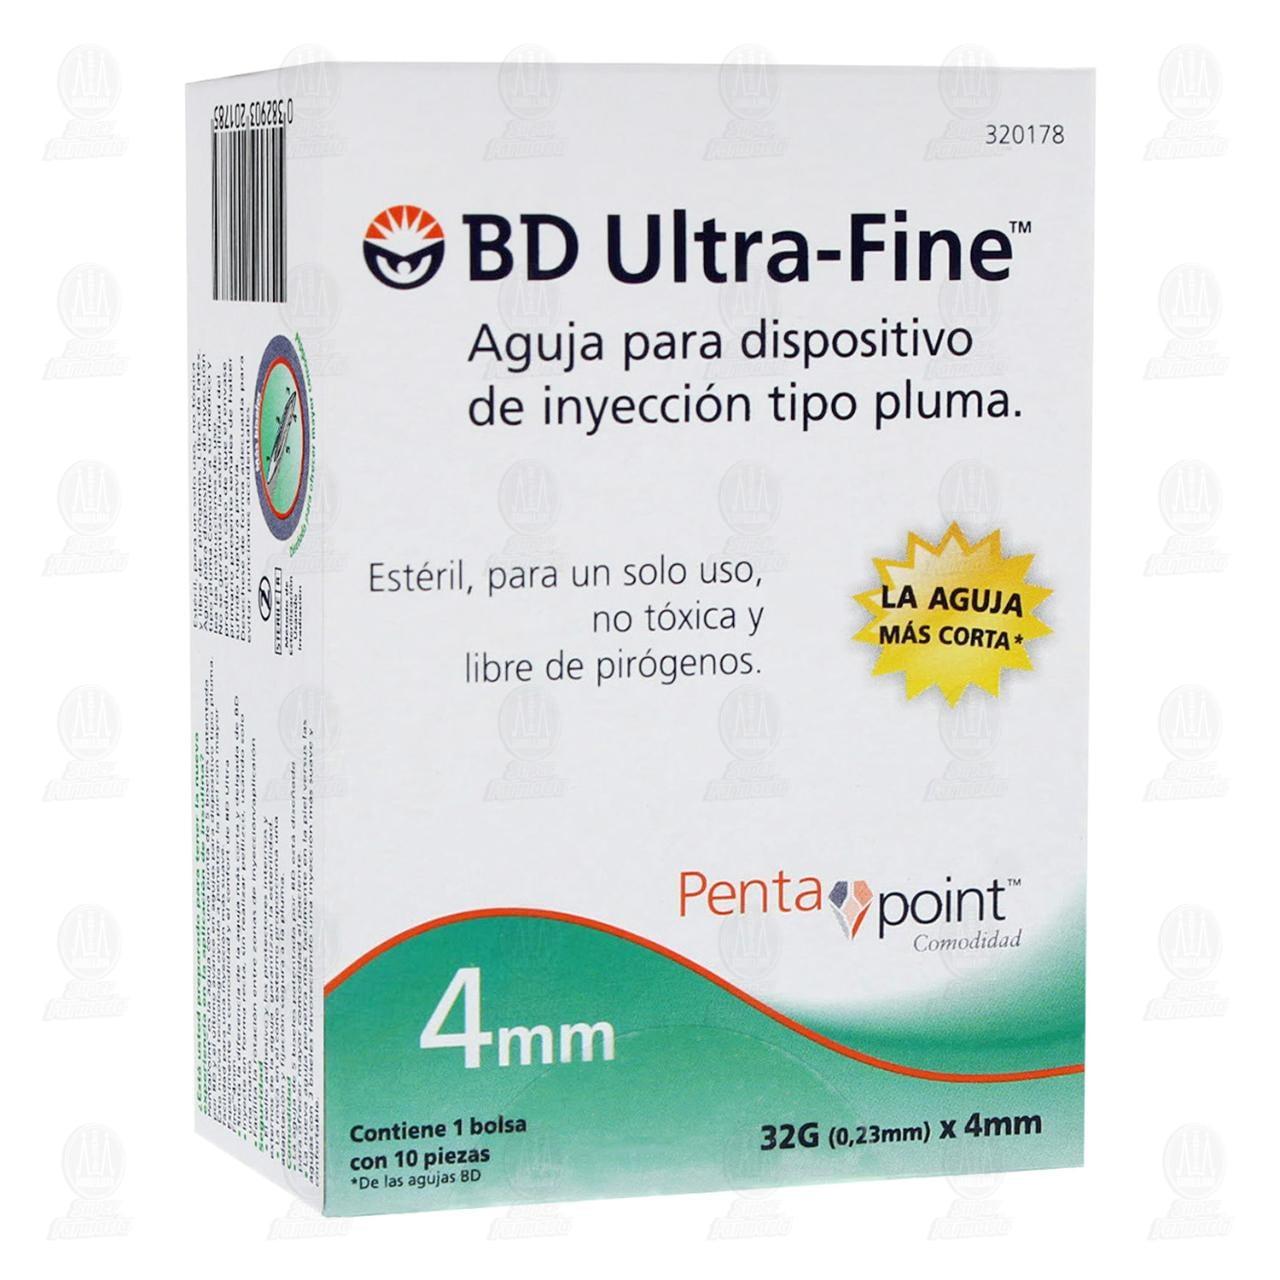 Aguja BD Ultra Fine 32gx4mm Pluma 10 Piezas